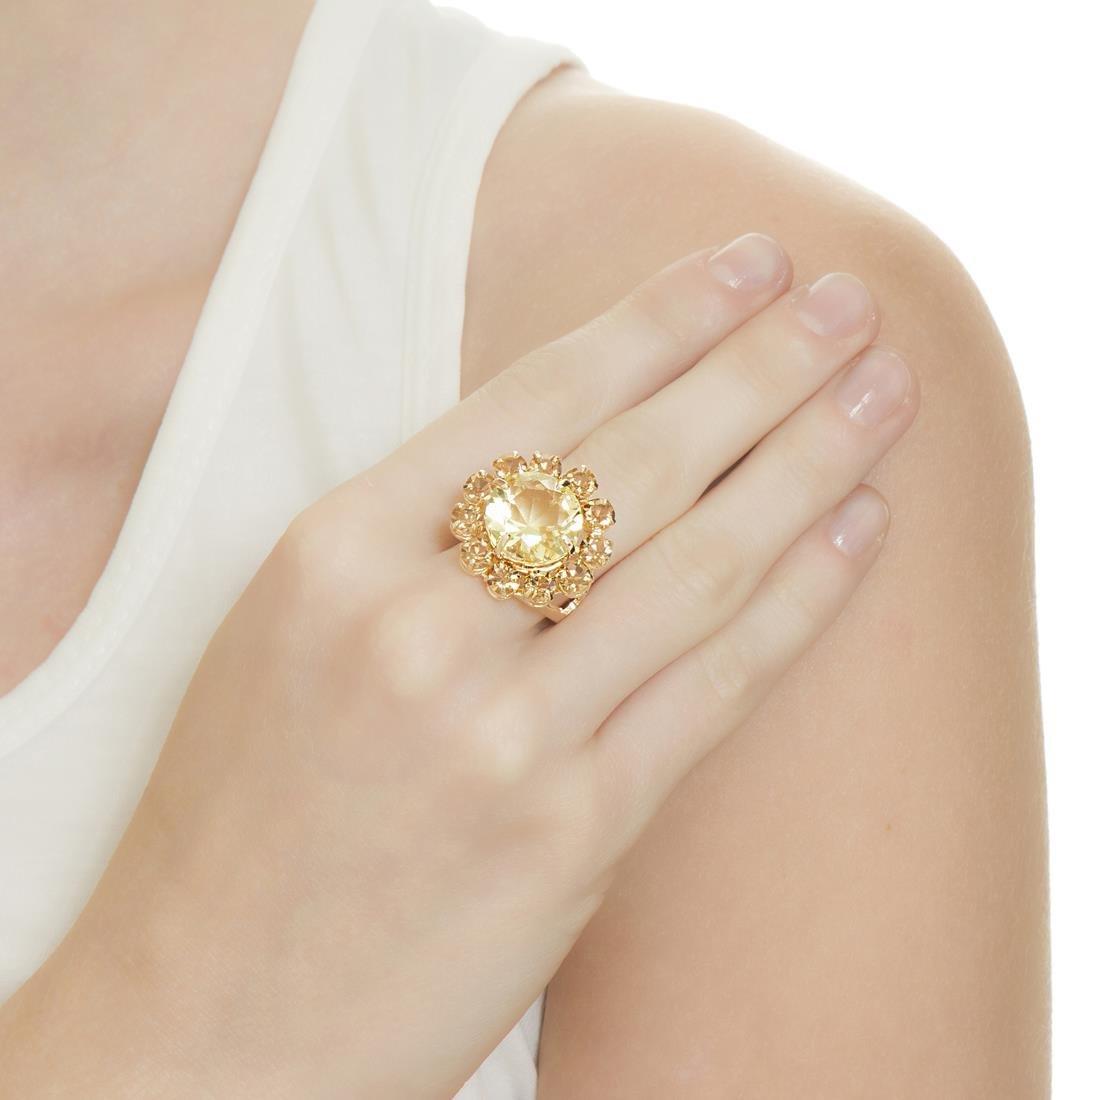 Anel Banho De Ouro Formato De Flor Cristal - Amarelo